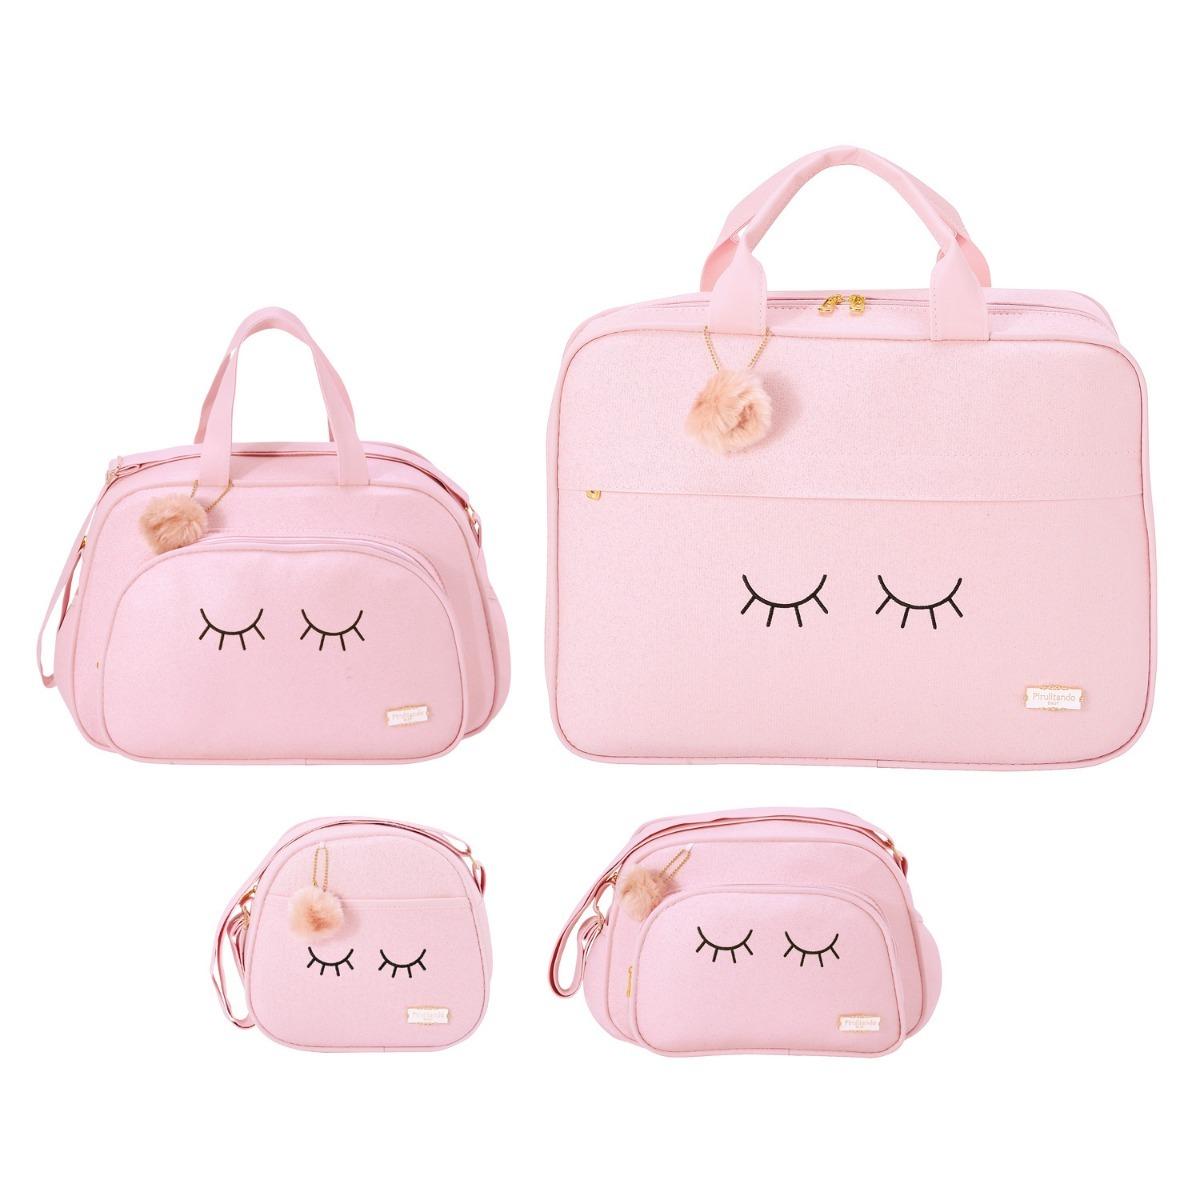 ee4ddbfd90 kit bolsa maternidade pirulitando chuva de amor rosa s  troc. Carregando  zoom.